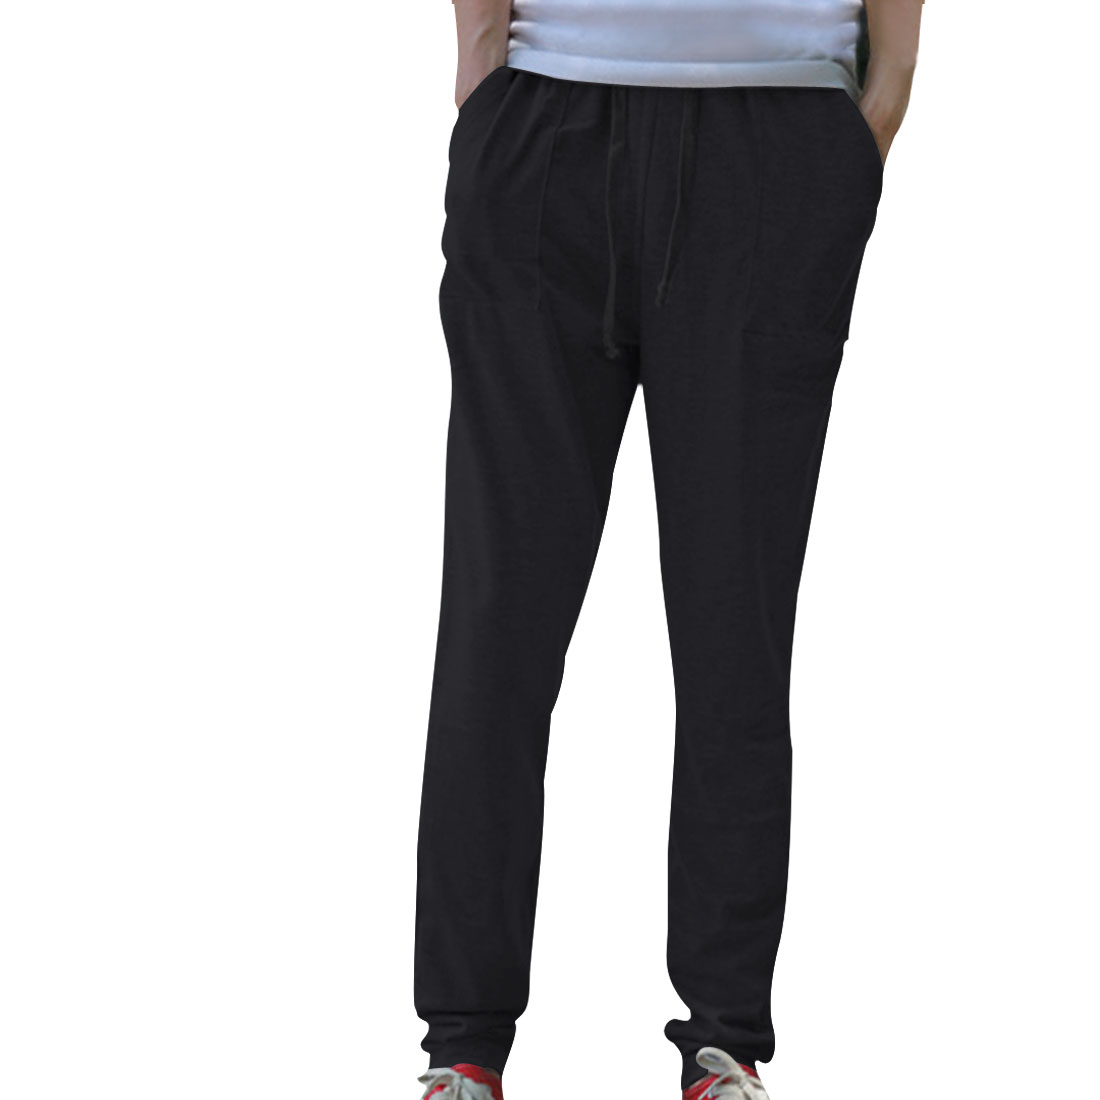 Mens Black New Fashion Winter Fleece Lined Low Rise Sweatpants W28